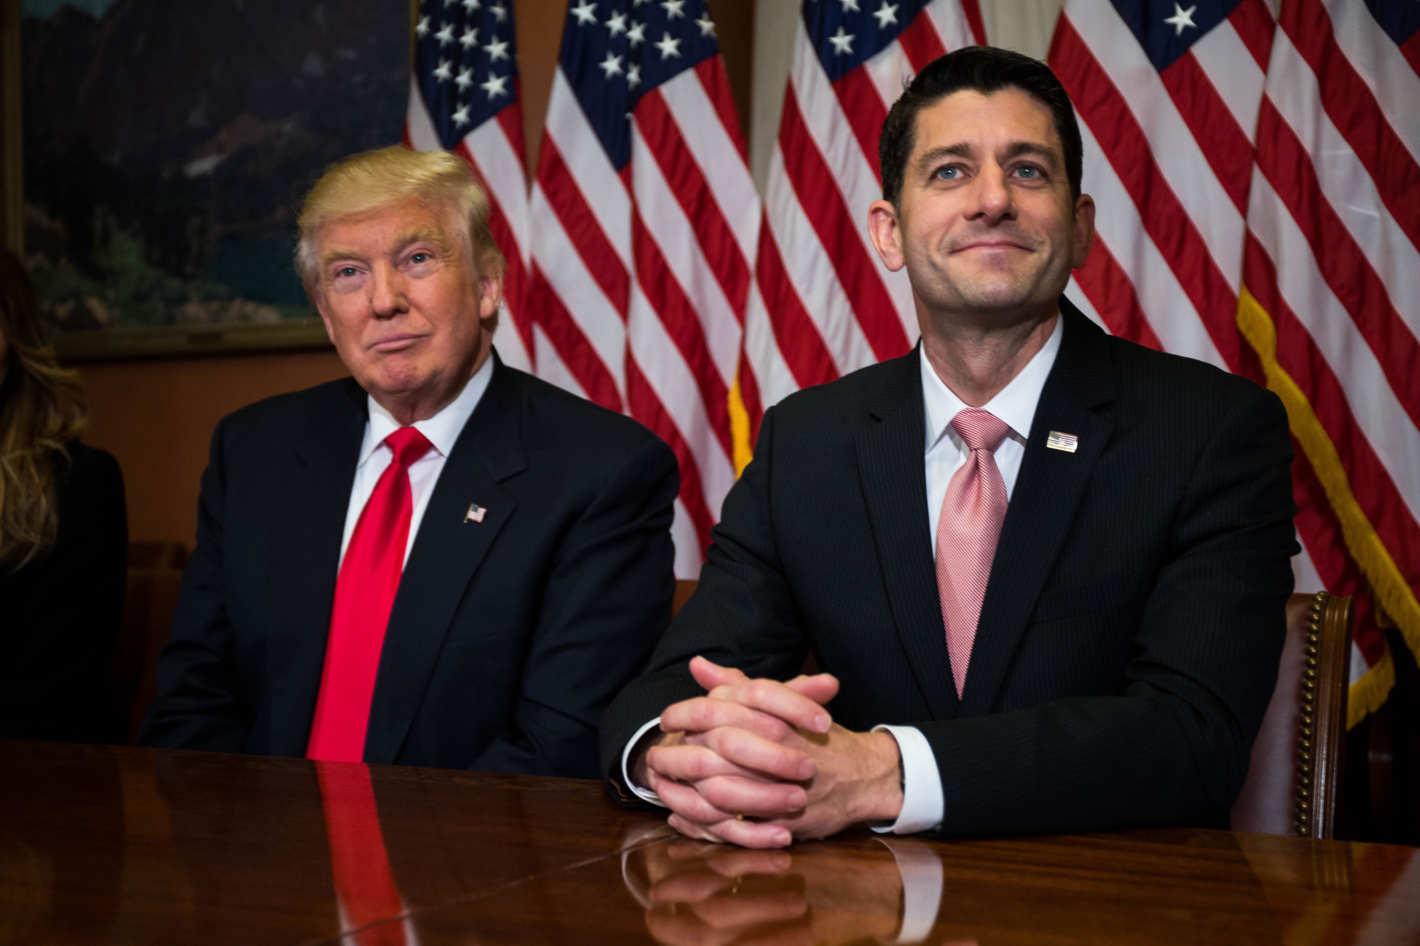 Paul Ryan Says He Received Assurances That Trump Is Not Considering Firing Mueller VIDEO